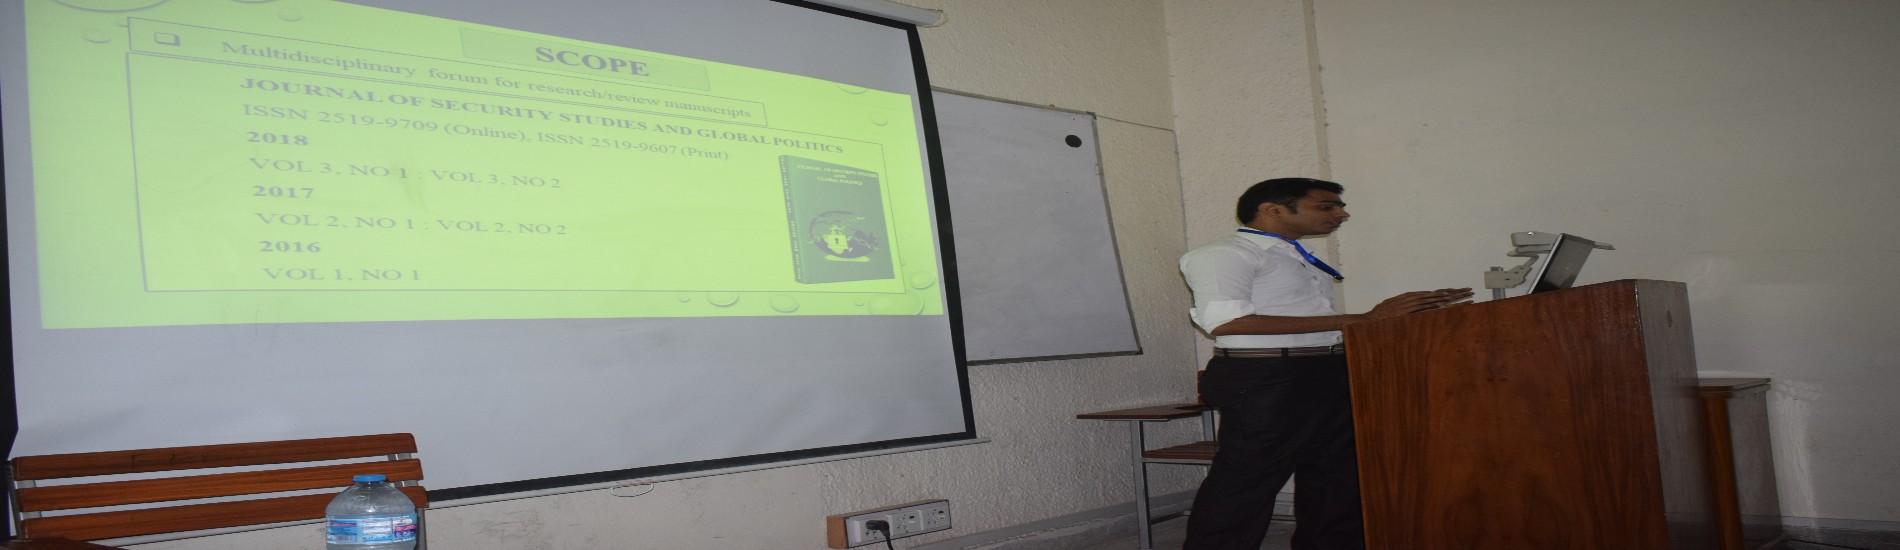 workshop2-1